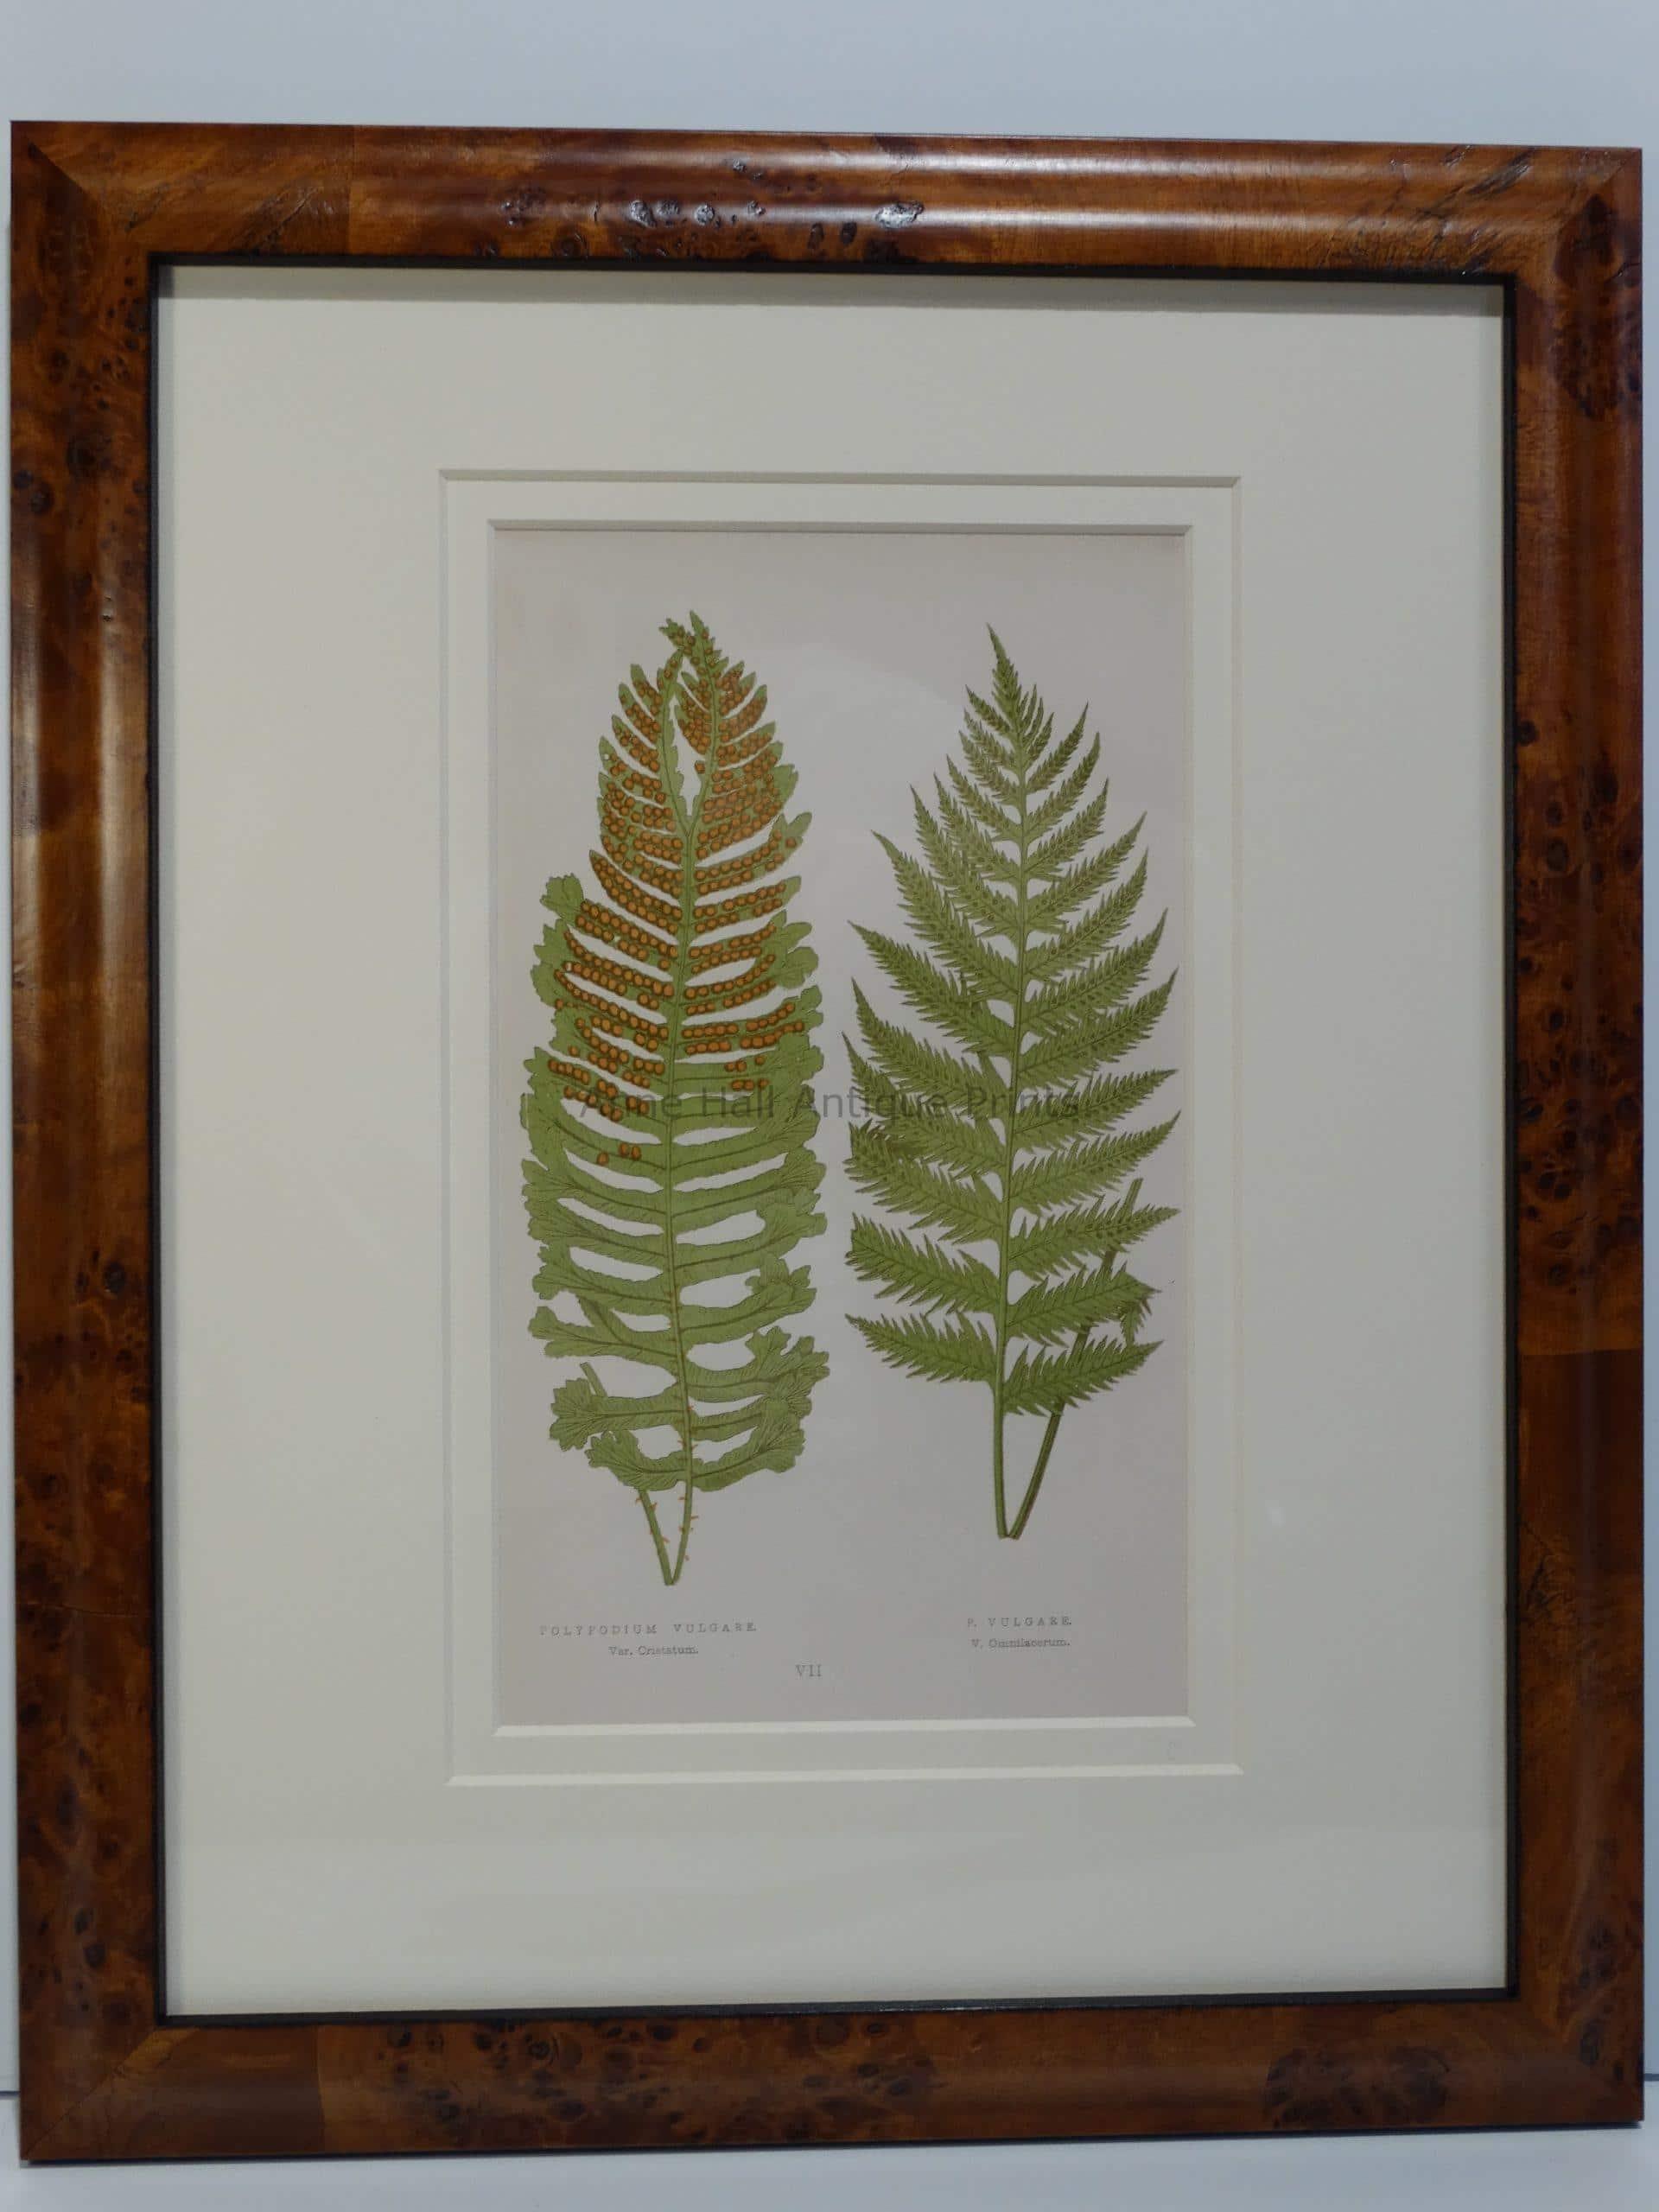 Framed Ferns Antique Lithograph 12